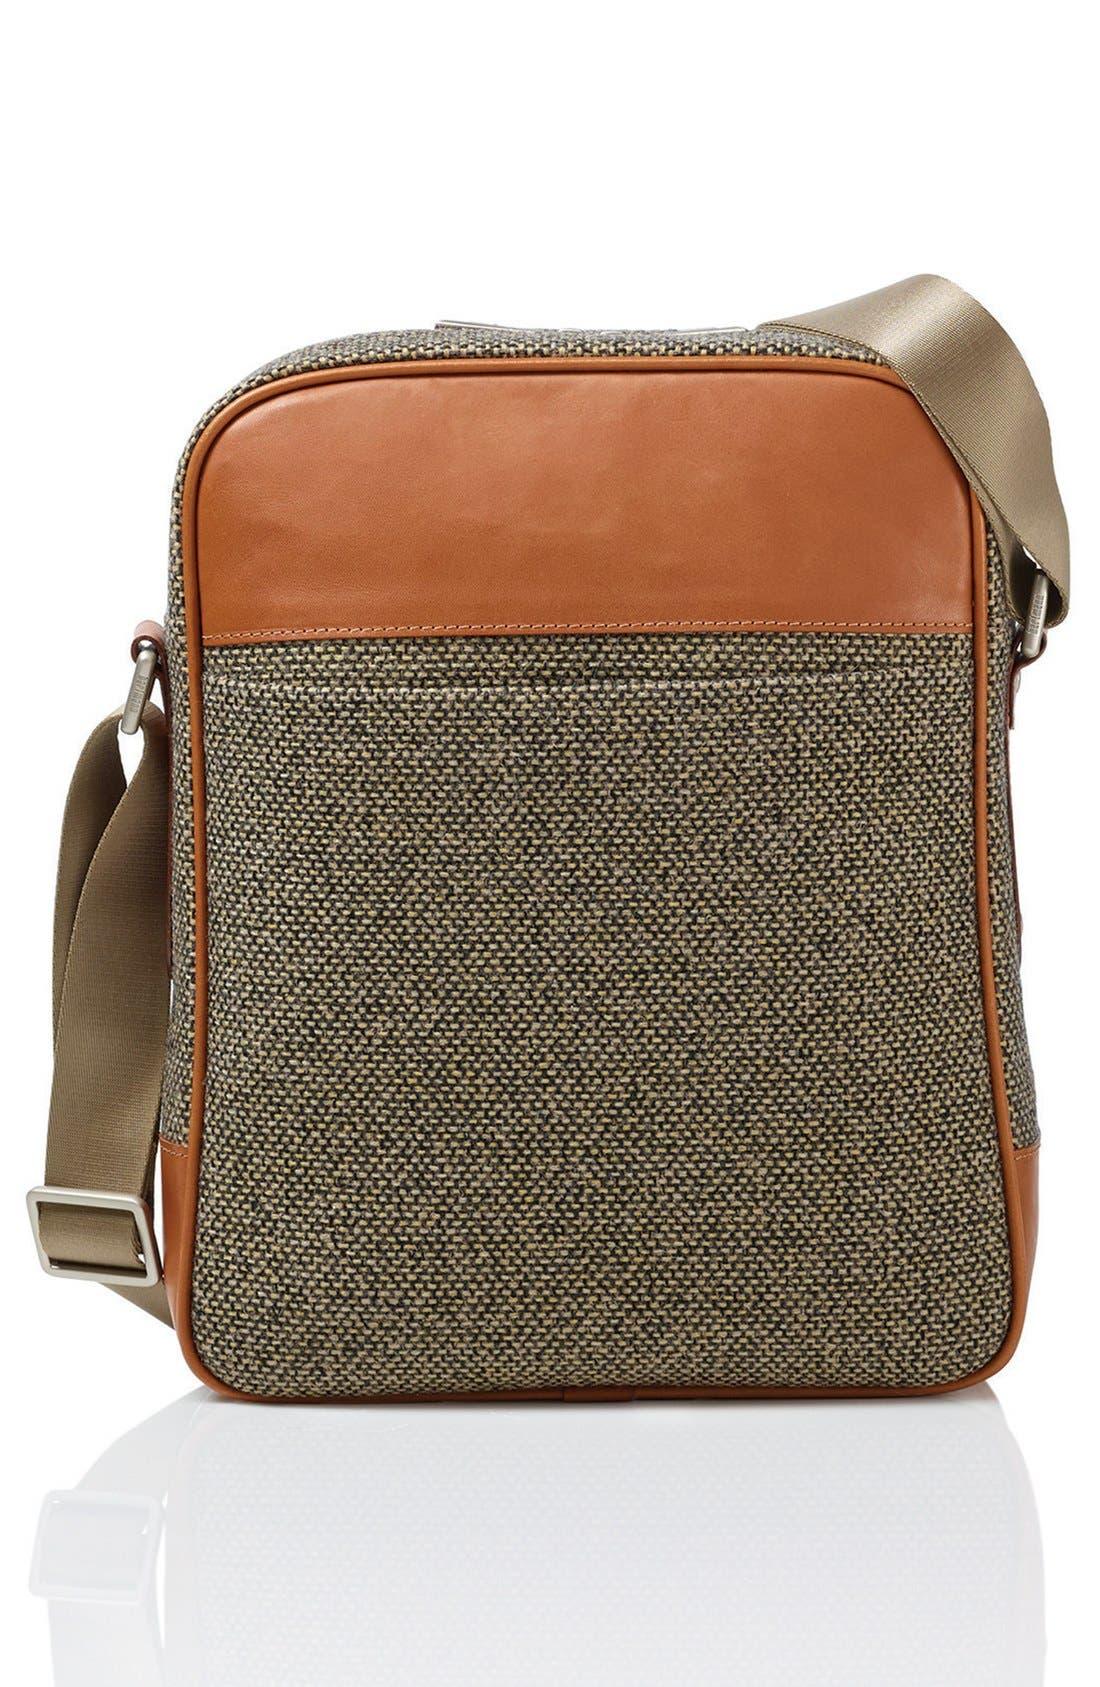 'Tweed Belting' Crossbody Bag,                             Alternate thumbnail 3, color,                             217